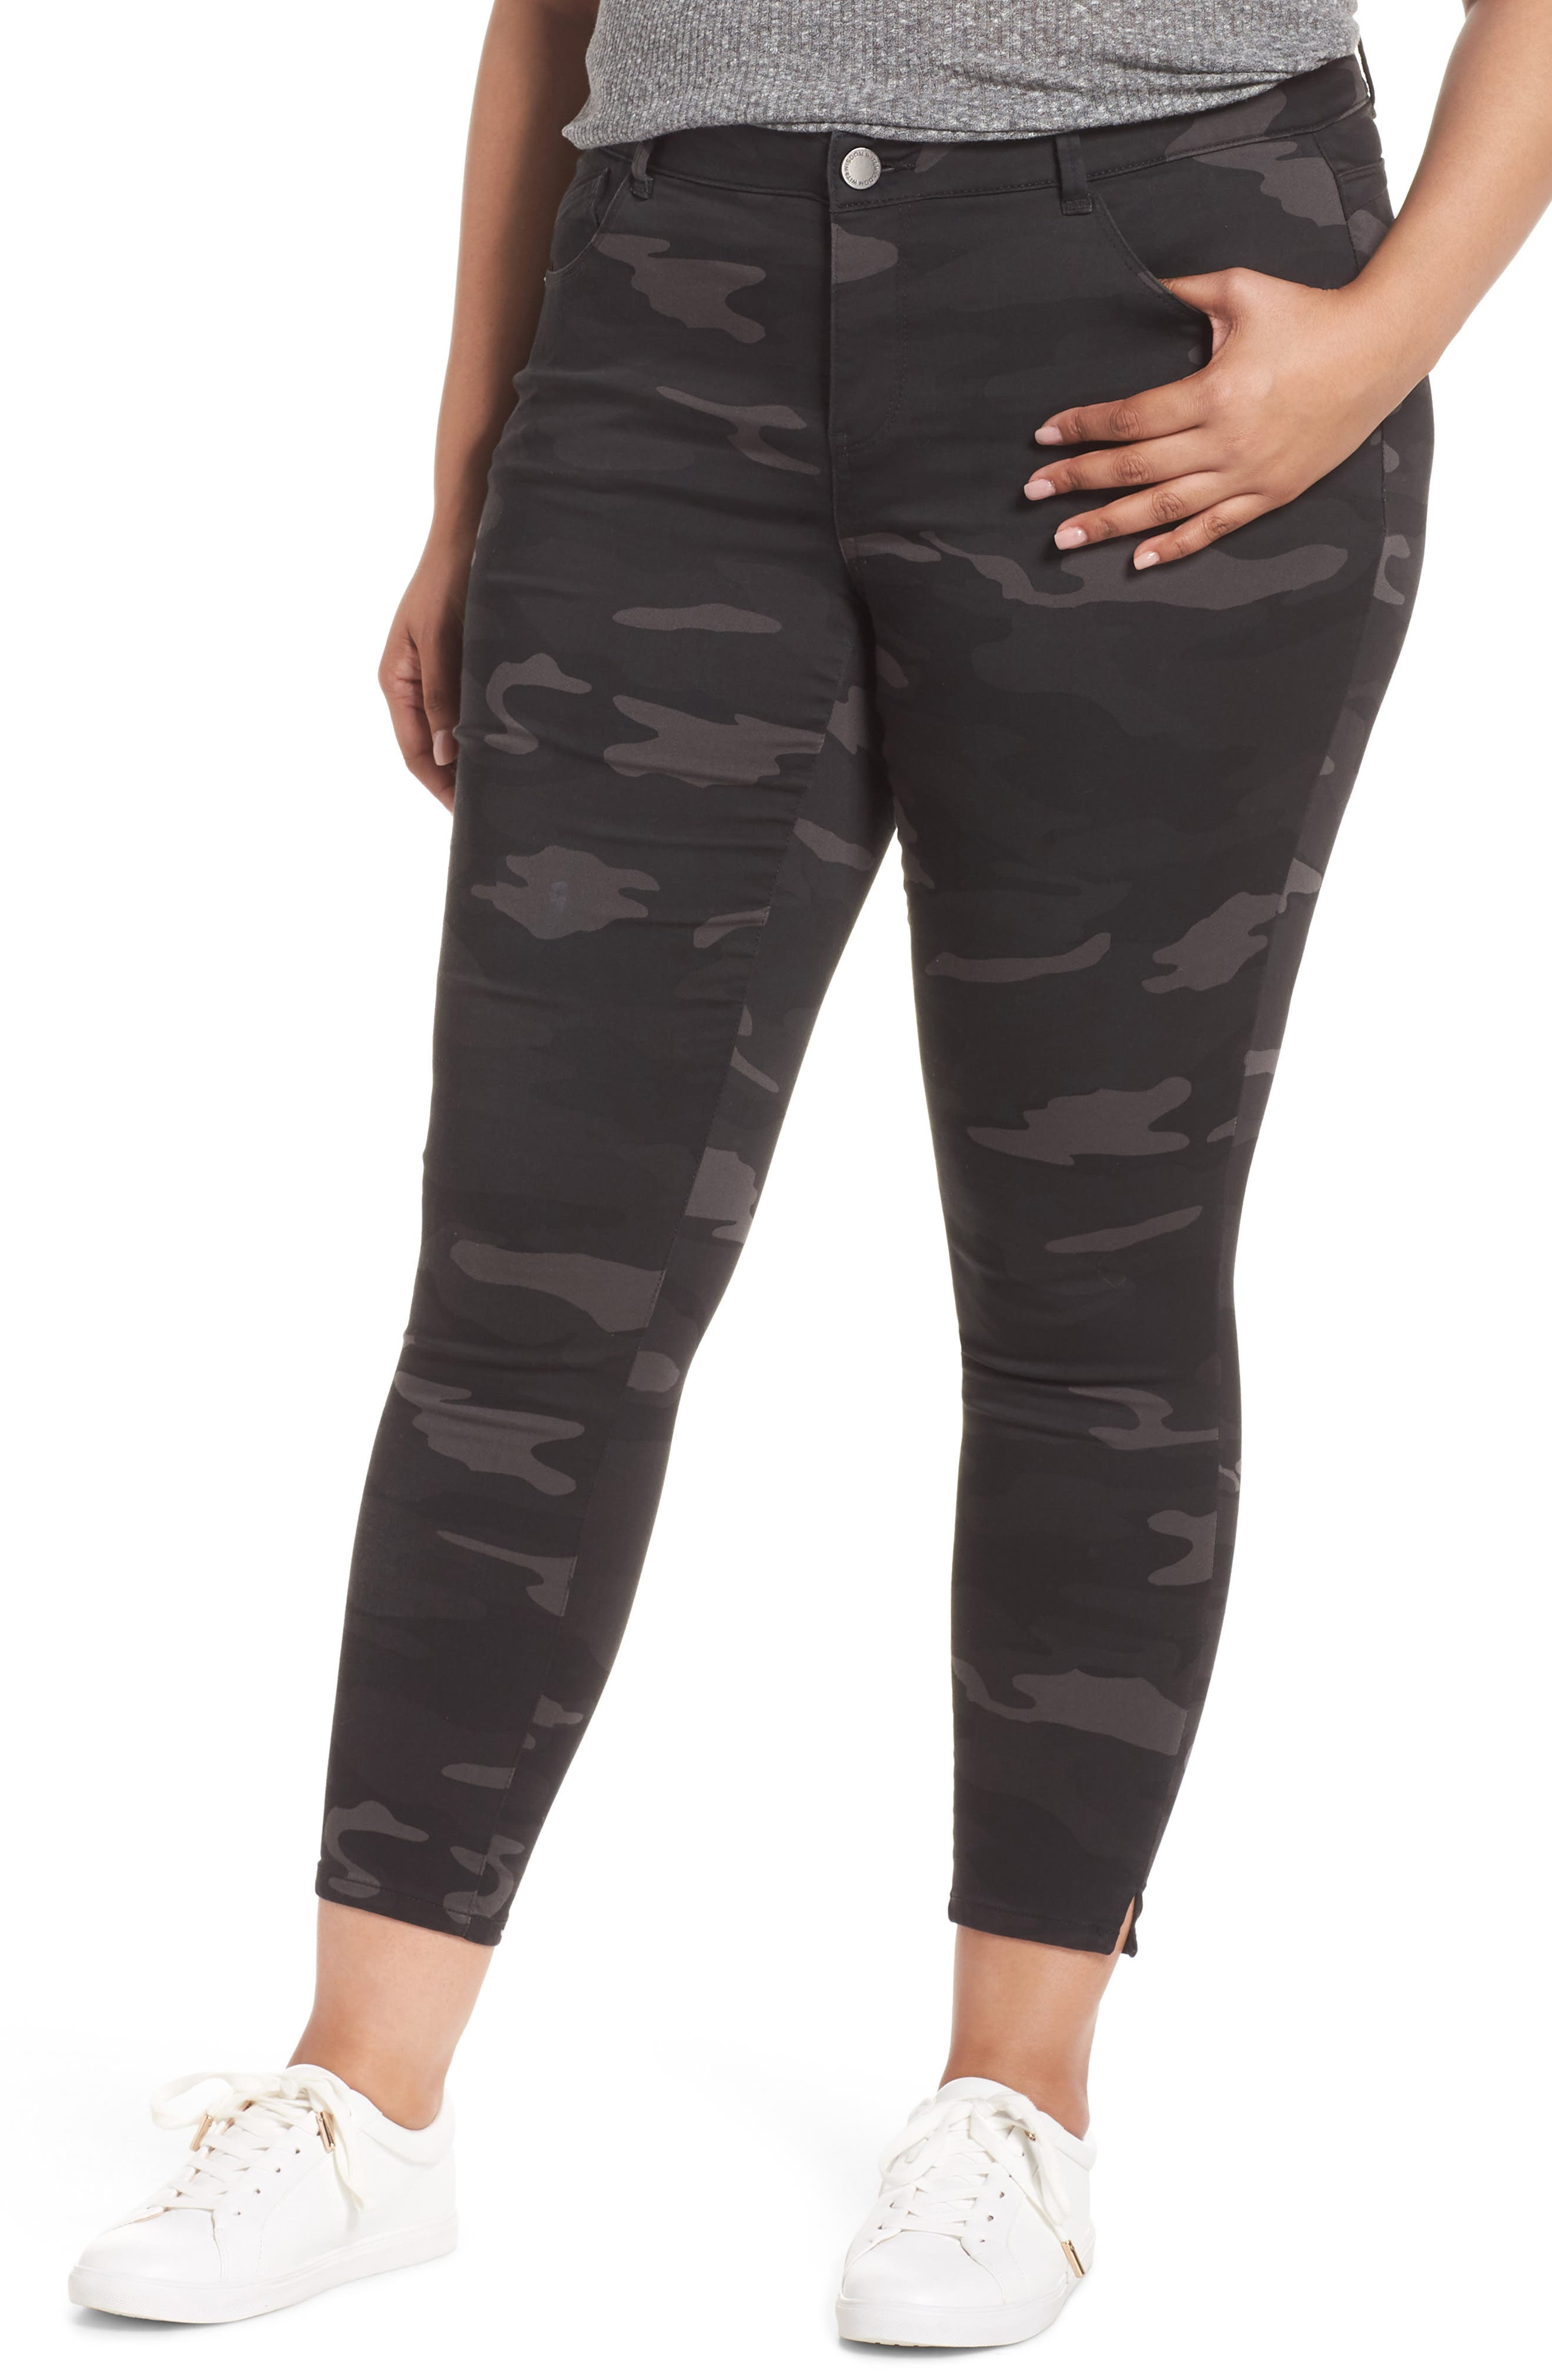 Ab-Solution Ankle Skimmer Jeans,                         Main,                         color, BLACK/ CAMO